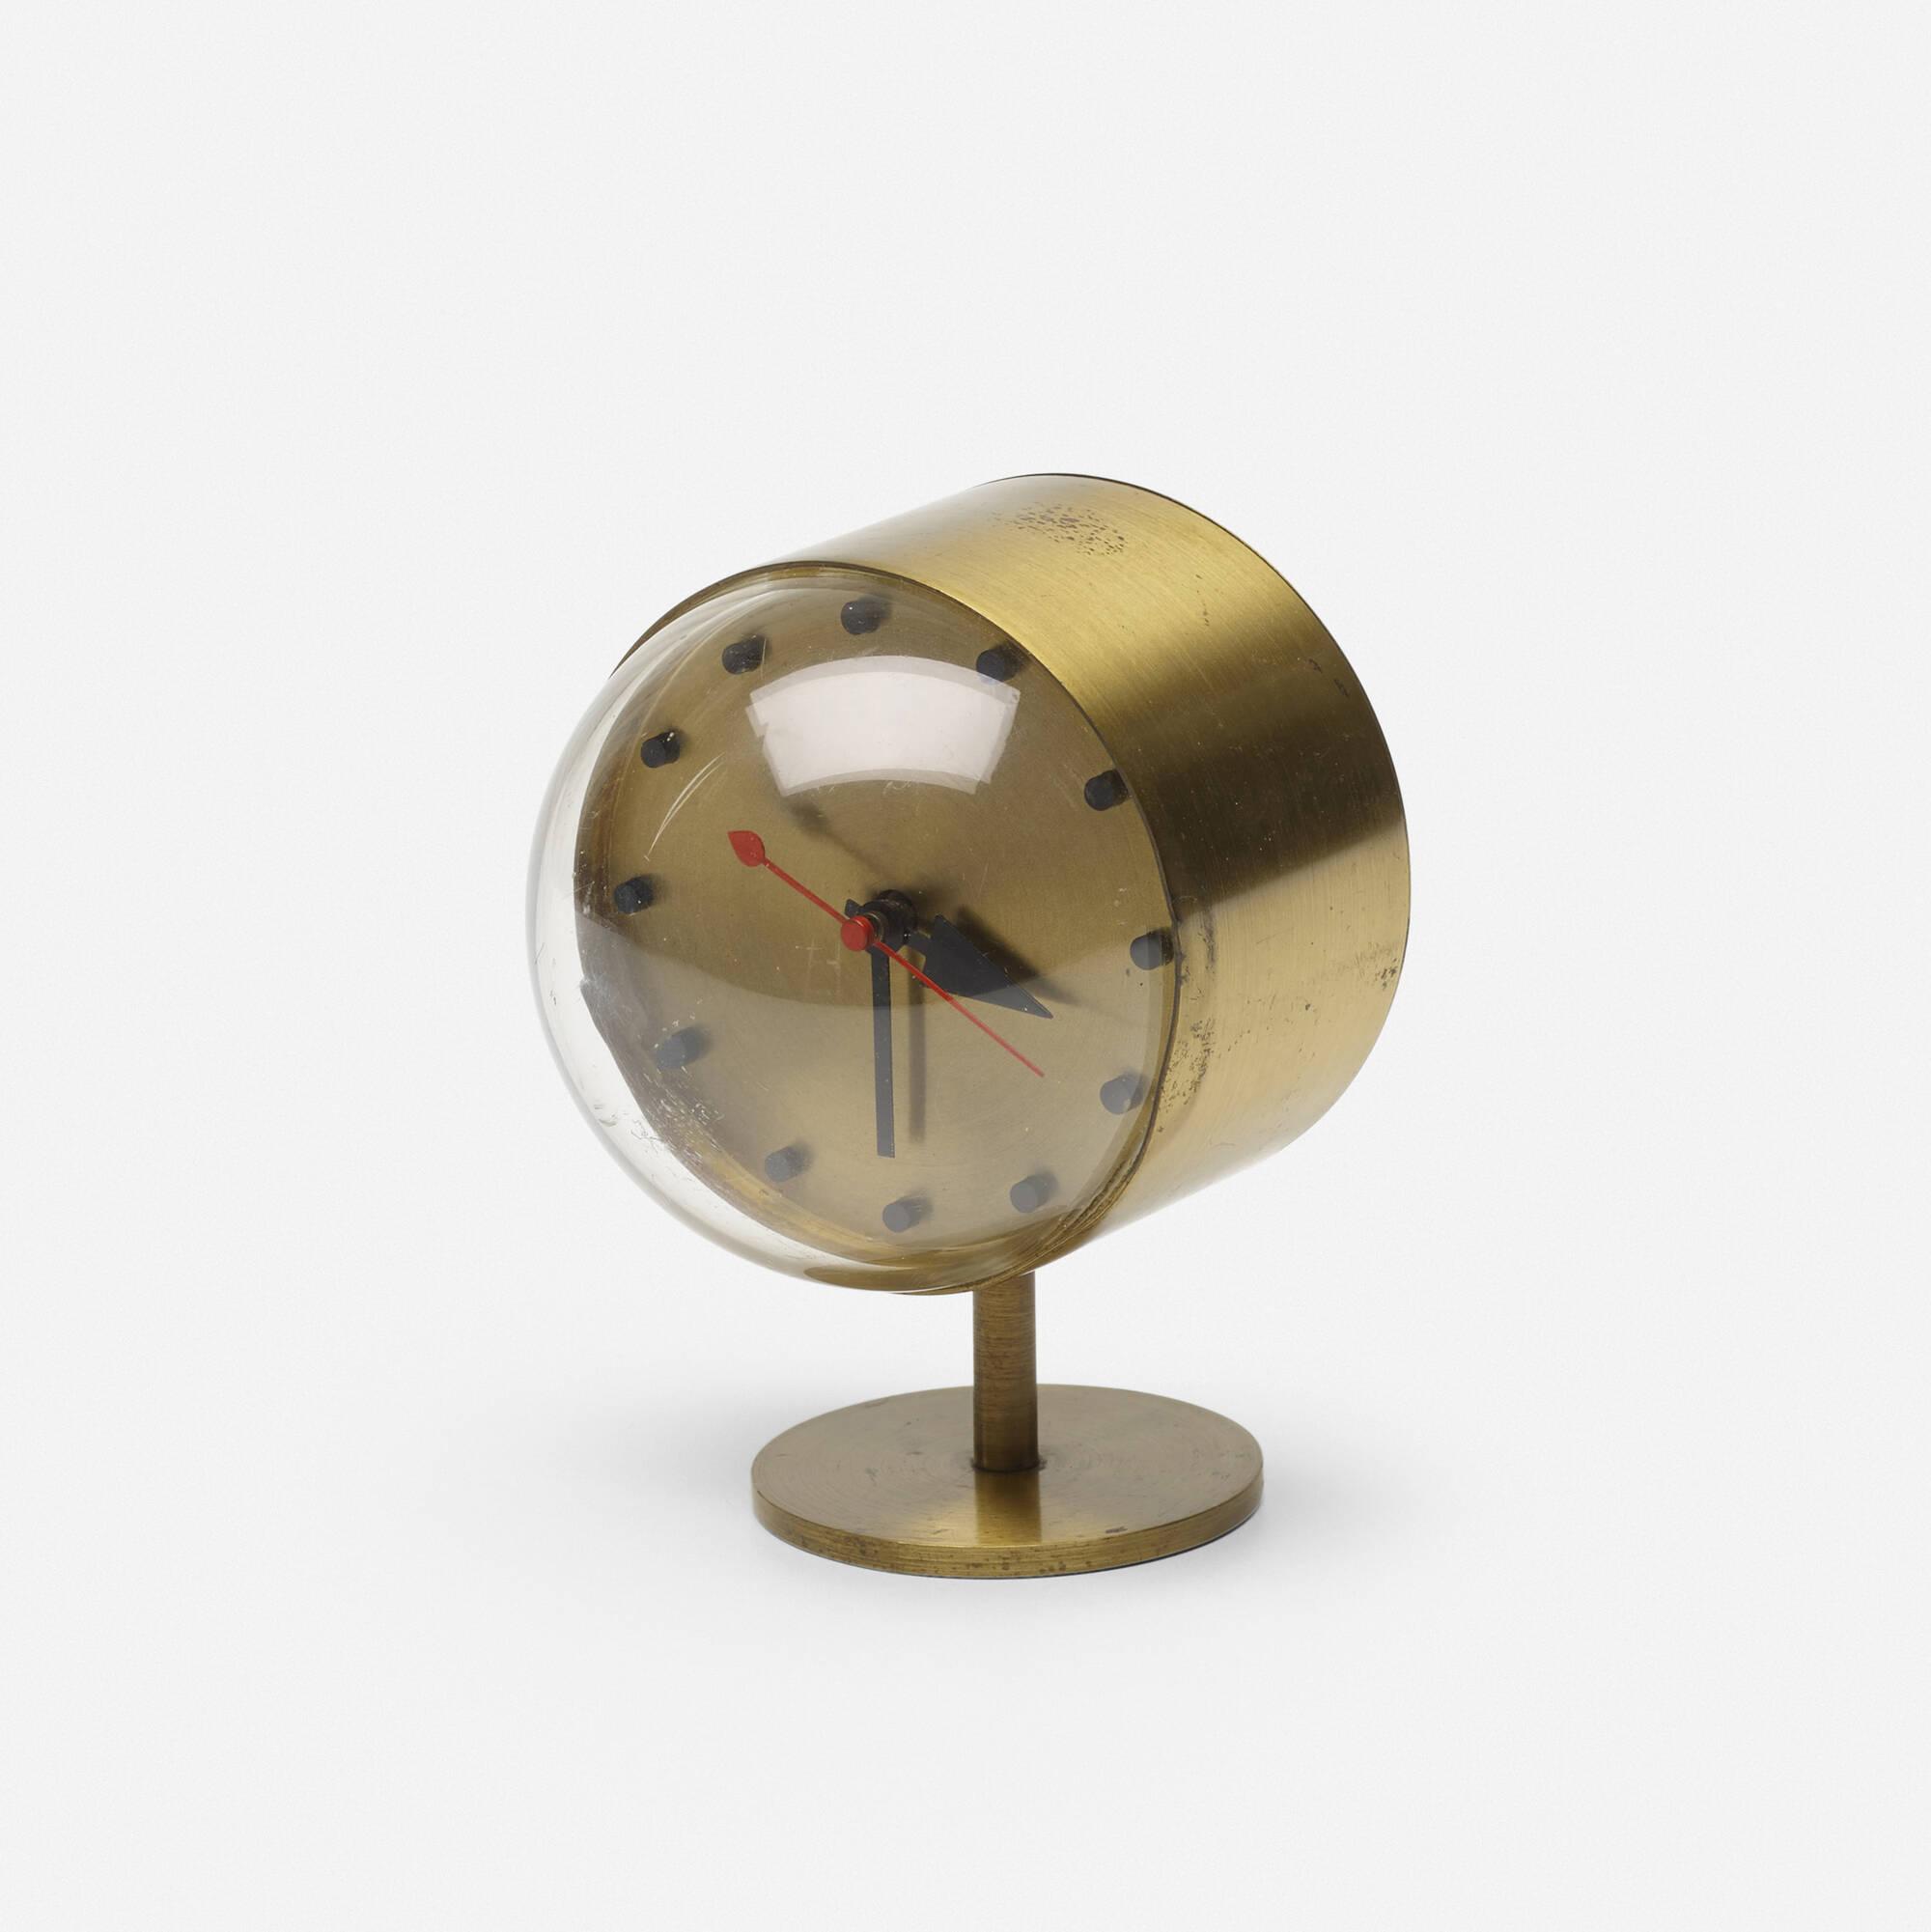 635: George Nelson U0026 Associates / Table Clock, Model 4766 (1 Of 2